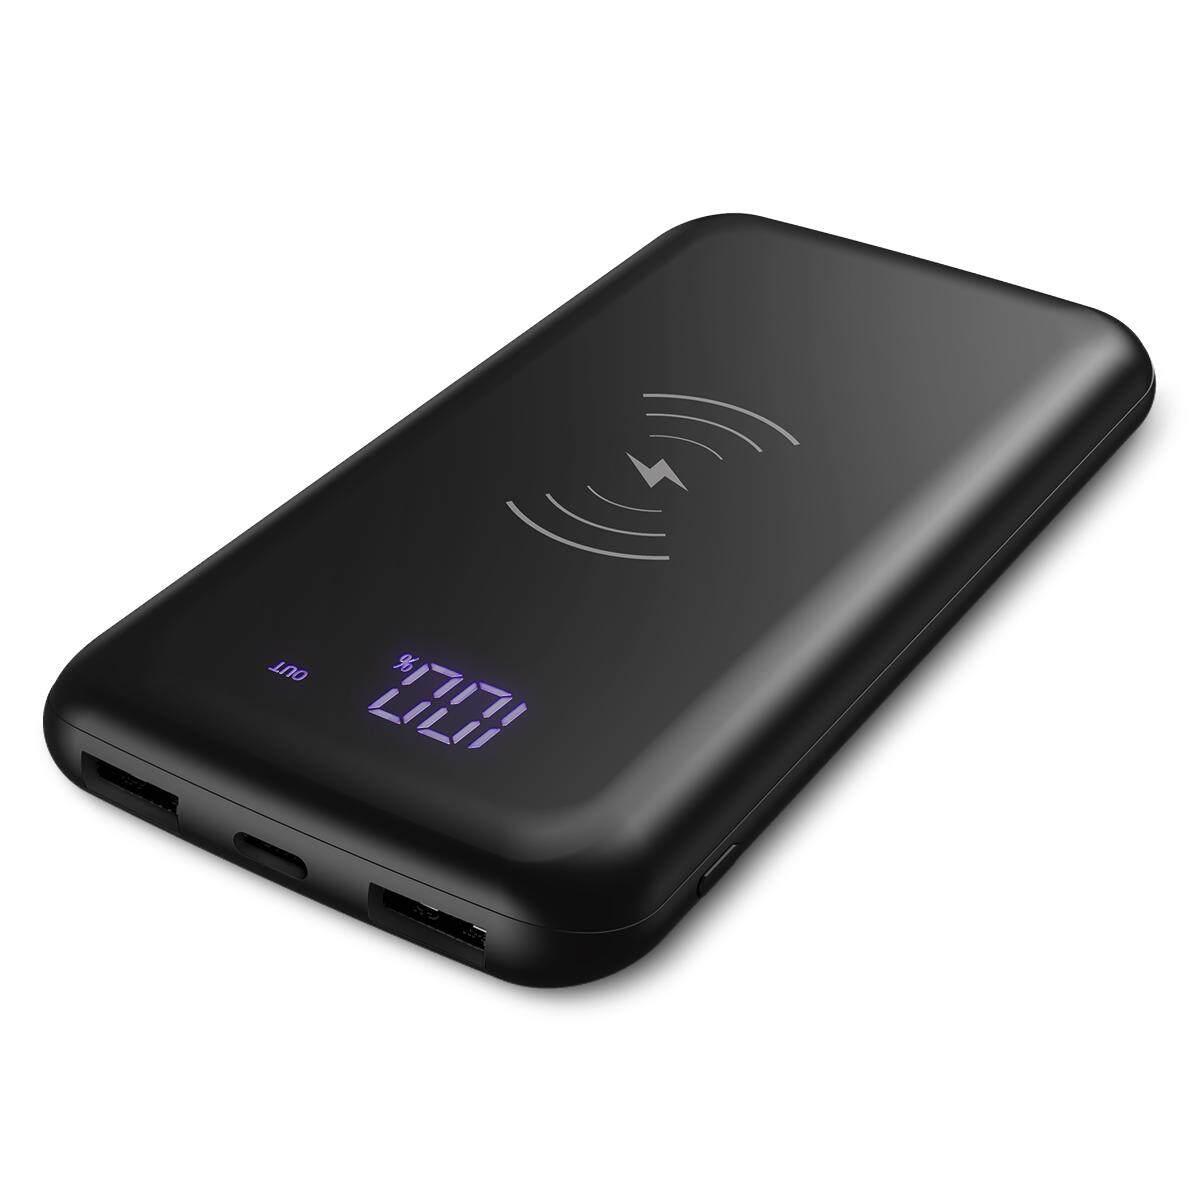 Dodocool 10000 MAh Power Bank Nirkabel Portable Charger Cepat Pengisian dengan Layar Digital LED Baterai Eksternal